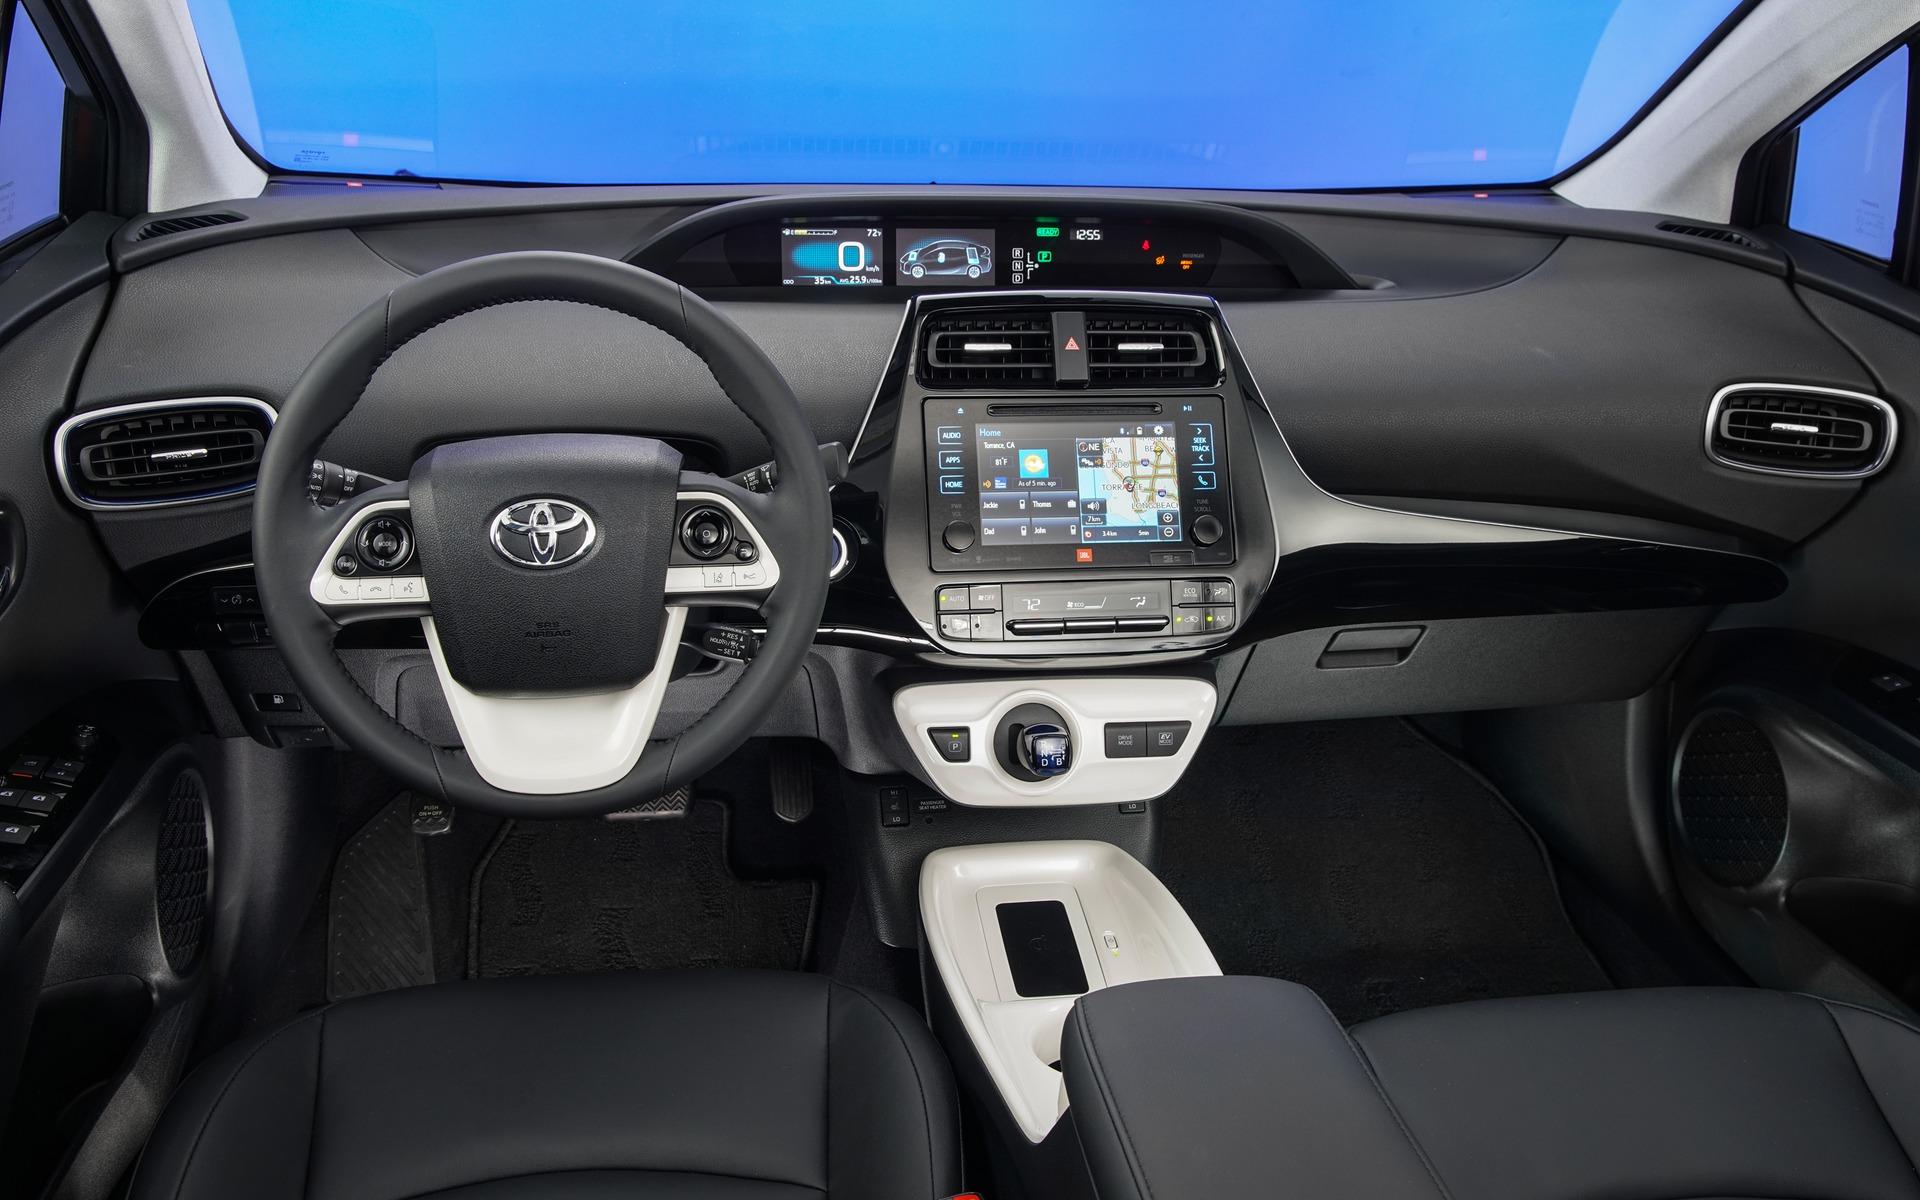 Toyota Prius 2016 - Habitacle et tableau de bord.